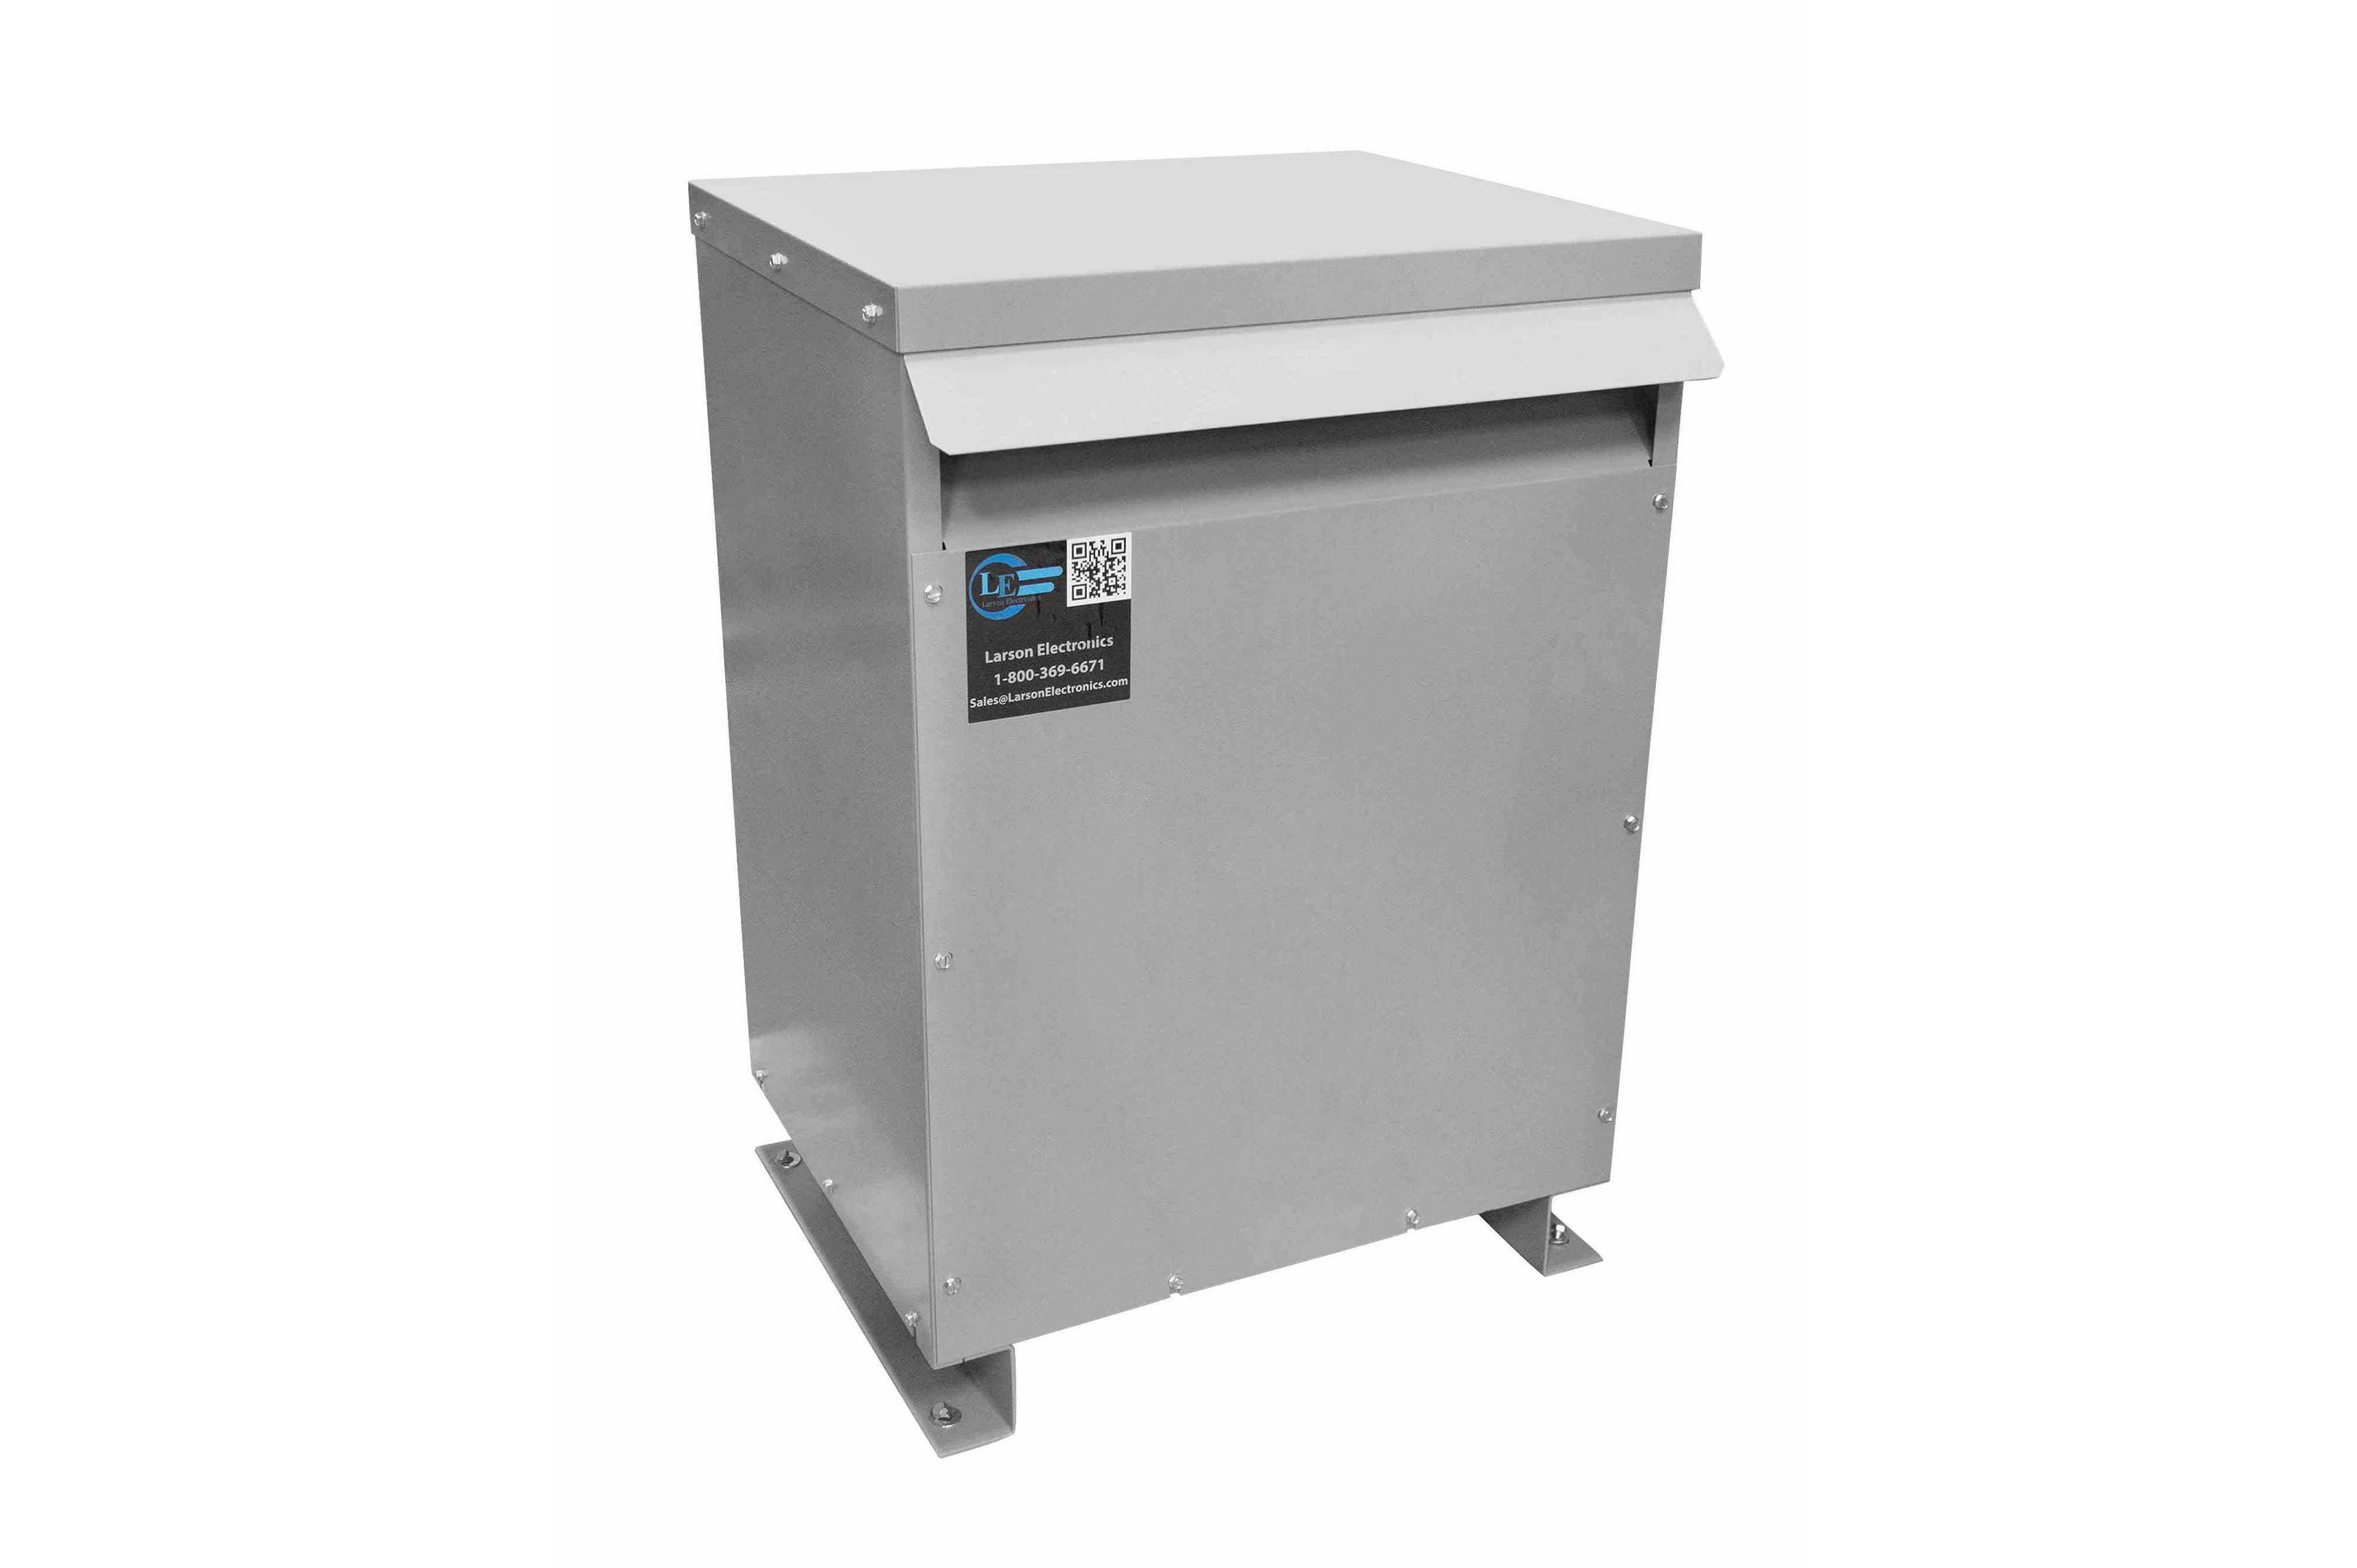 150 kVA 3PH DOE Transformer, 460V Delta Primary, 415Y/240 Wye-N Secondary, N3R, Ventilated, 60 Hz